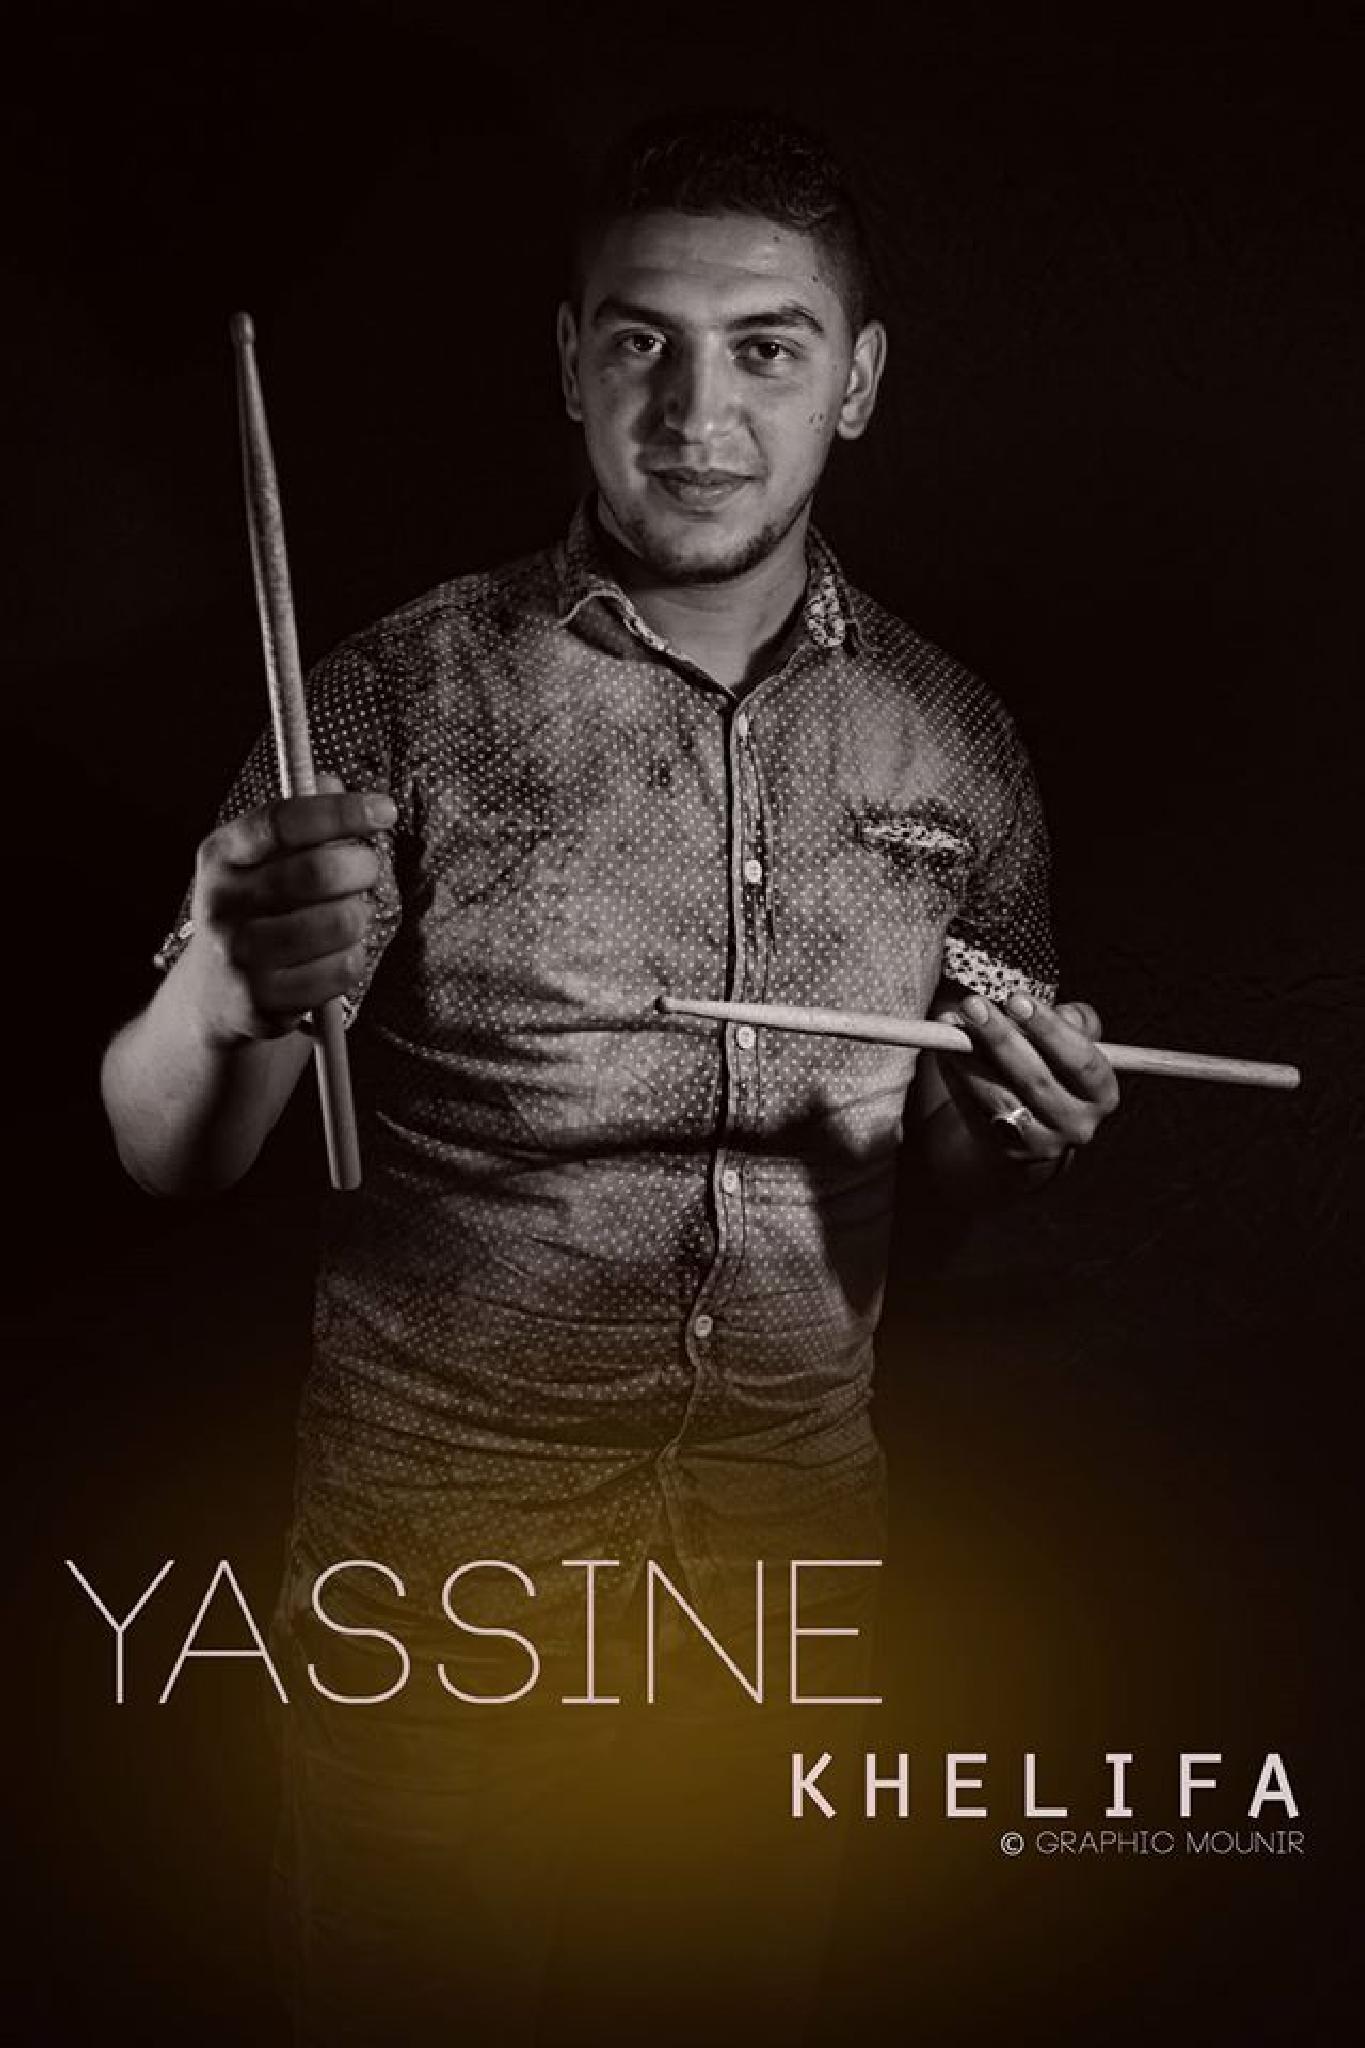 YASSSINE KHELIFA  by MOUNIR KAYSSOUMI